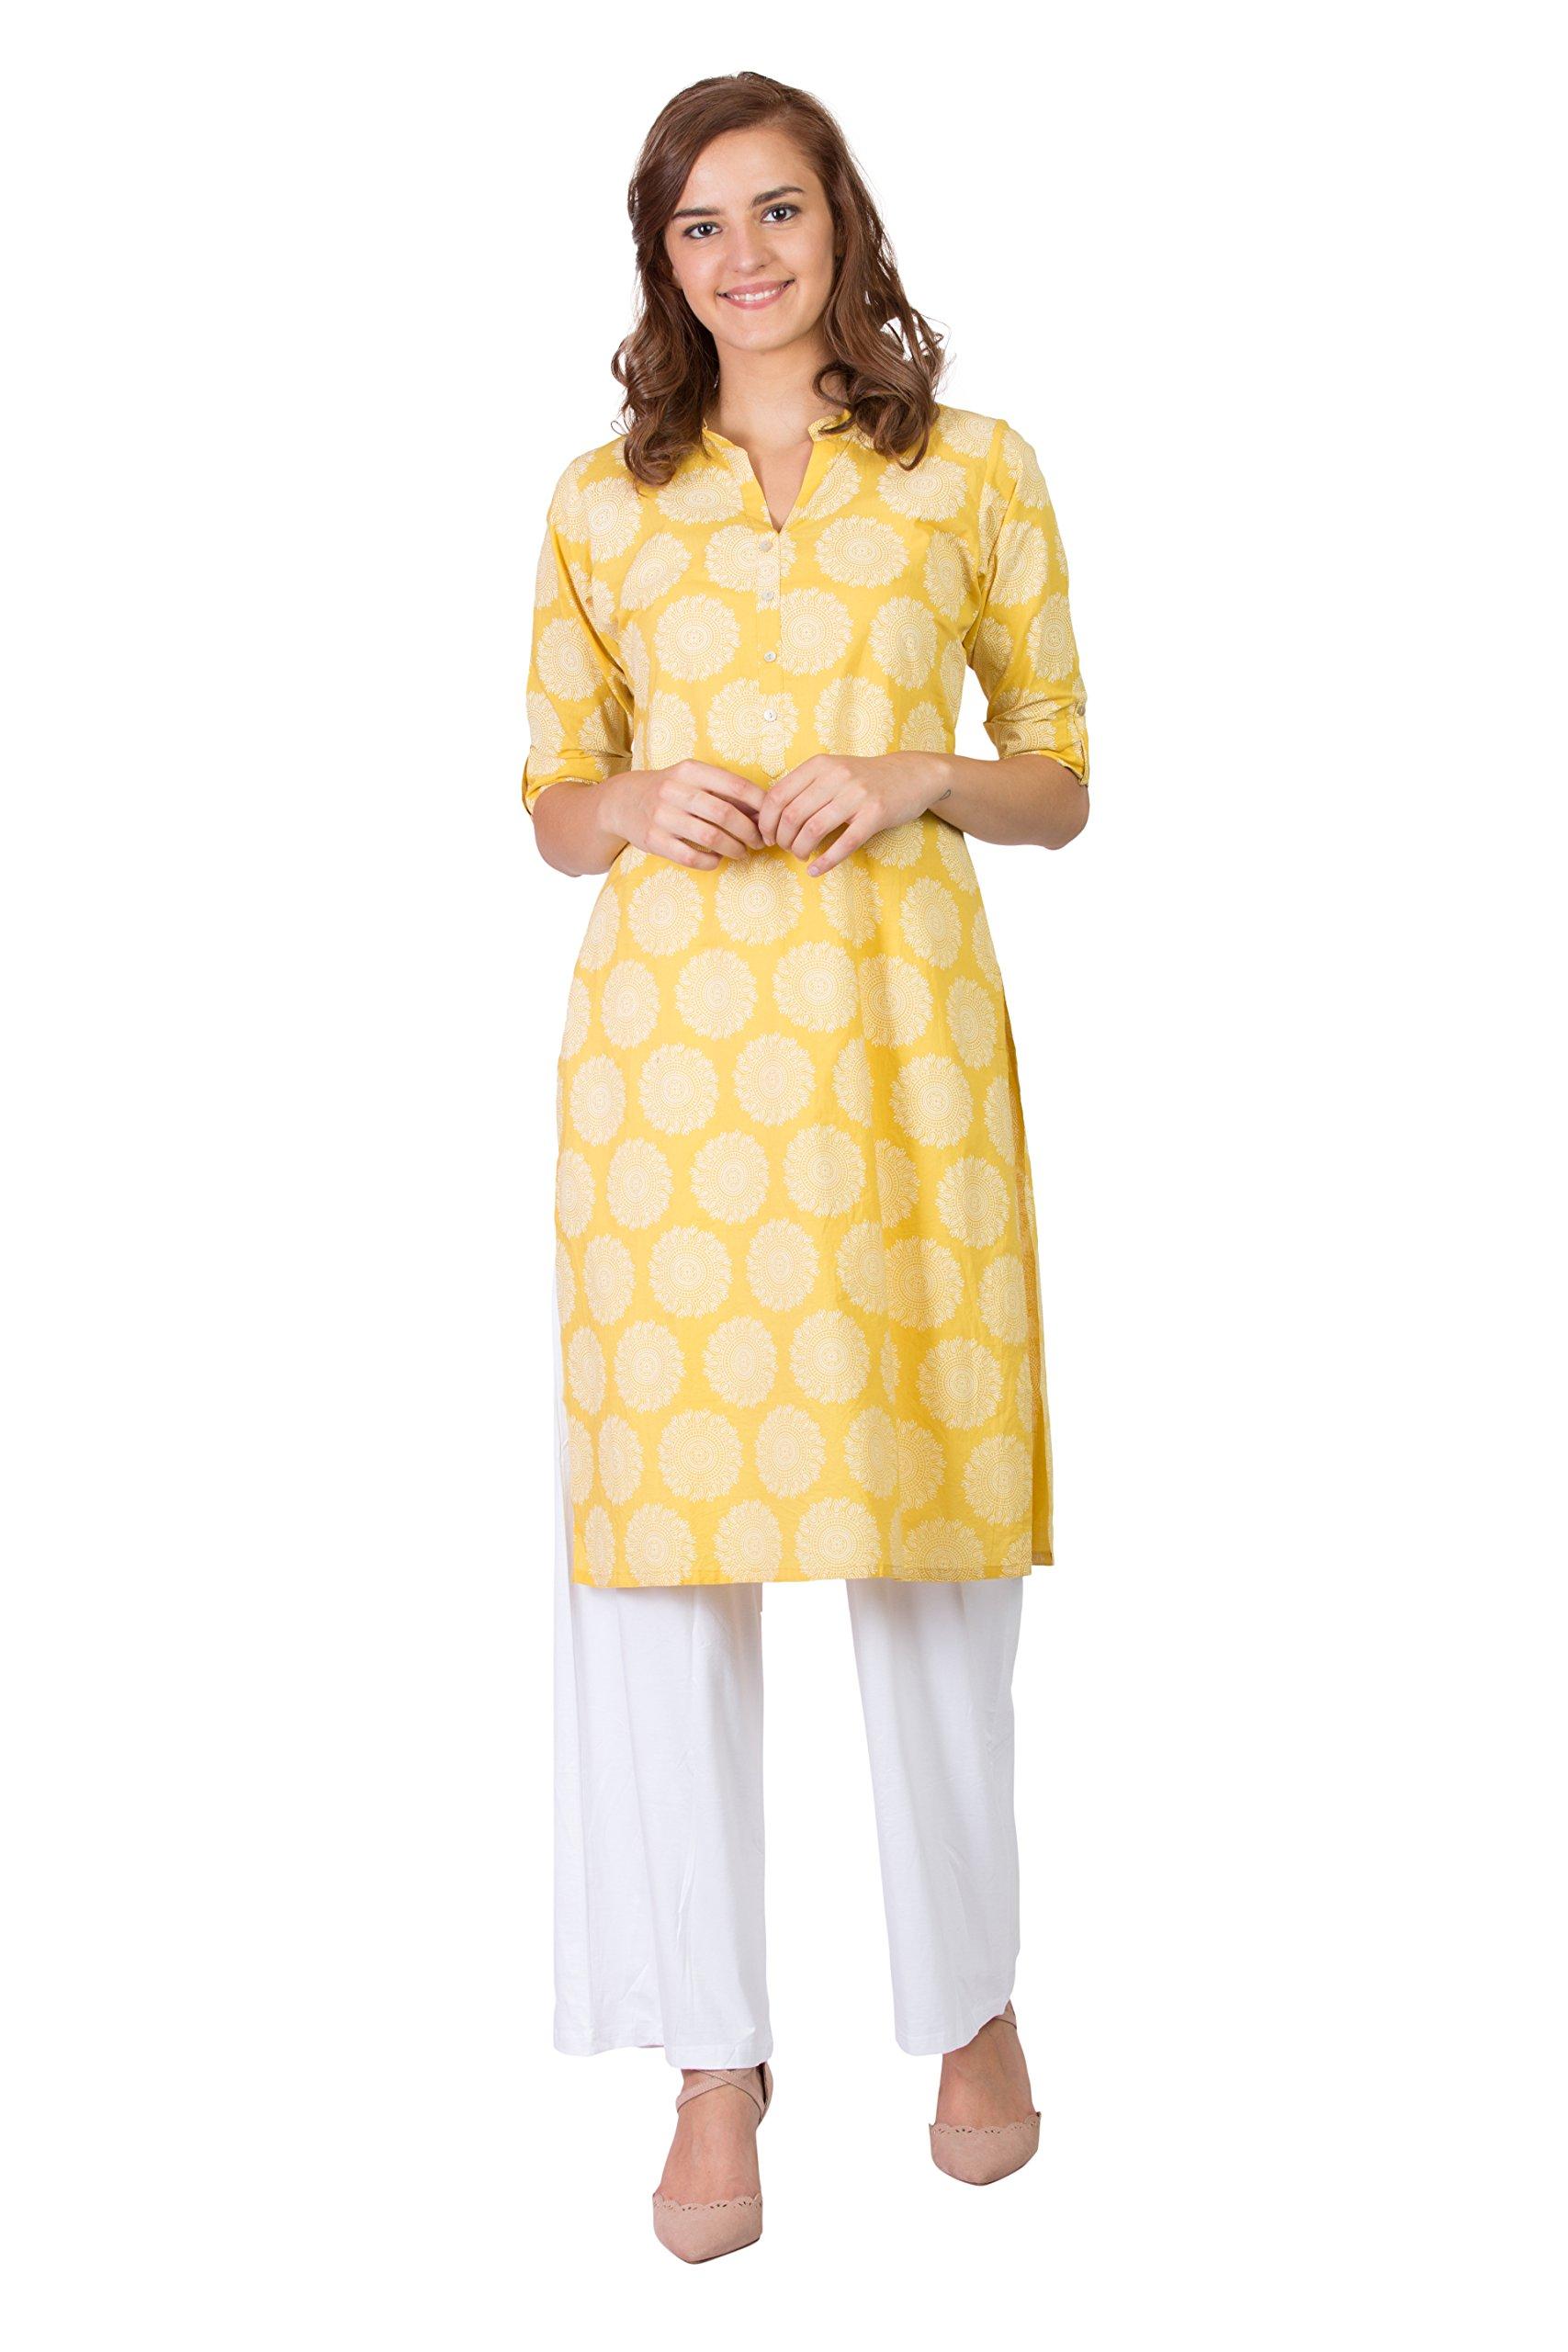 SABHYATA Women Kurta Designer Ethnic Long Dress Casual Tunic Kurti for Women Ladies Partywear Material 100% Pure Cotton Chinese Collar Medium Mustard